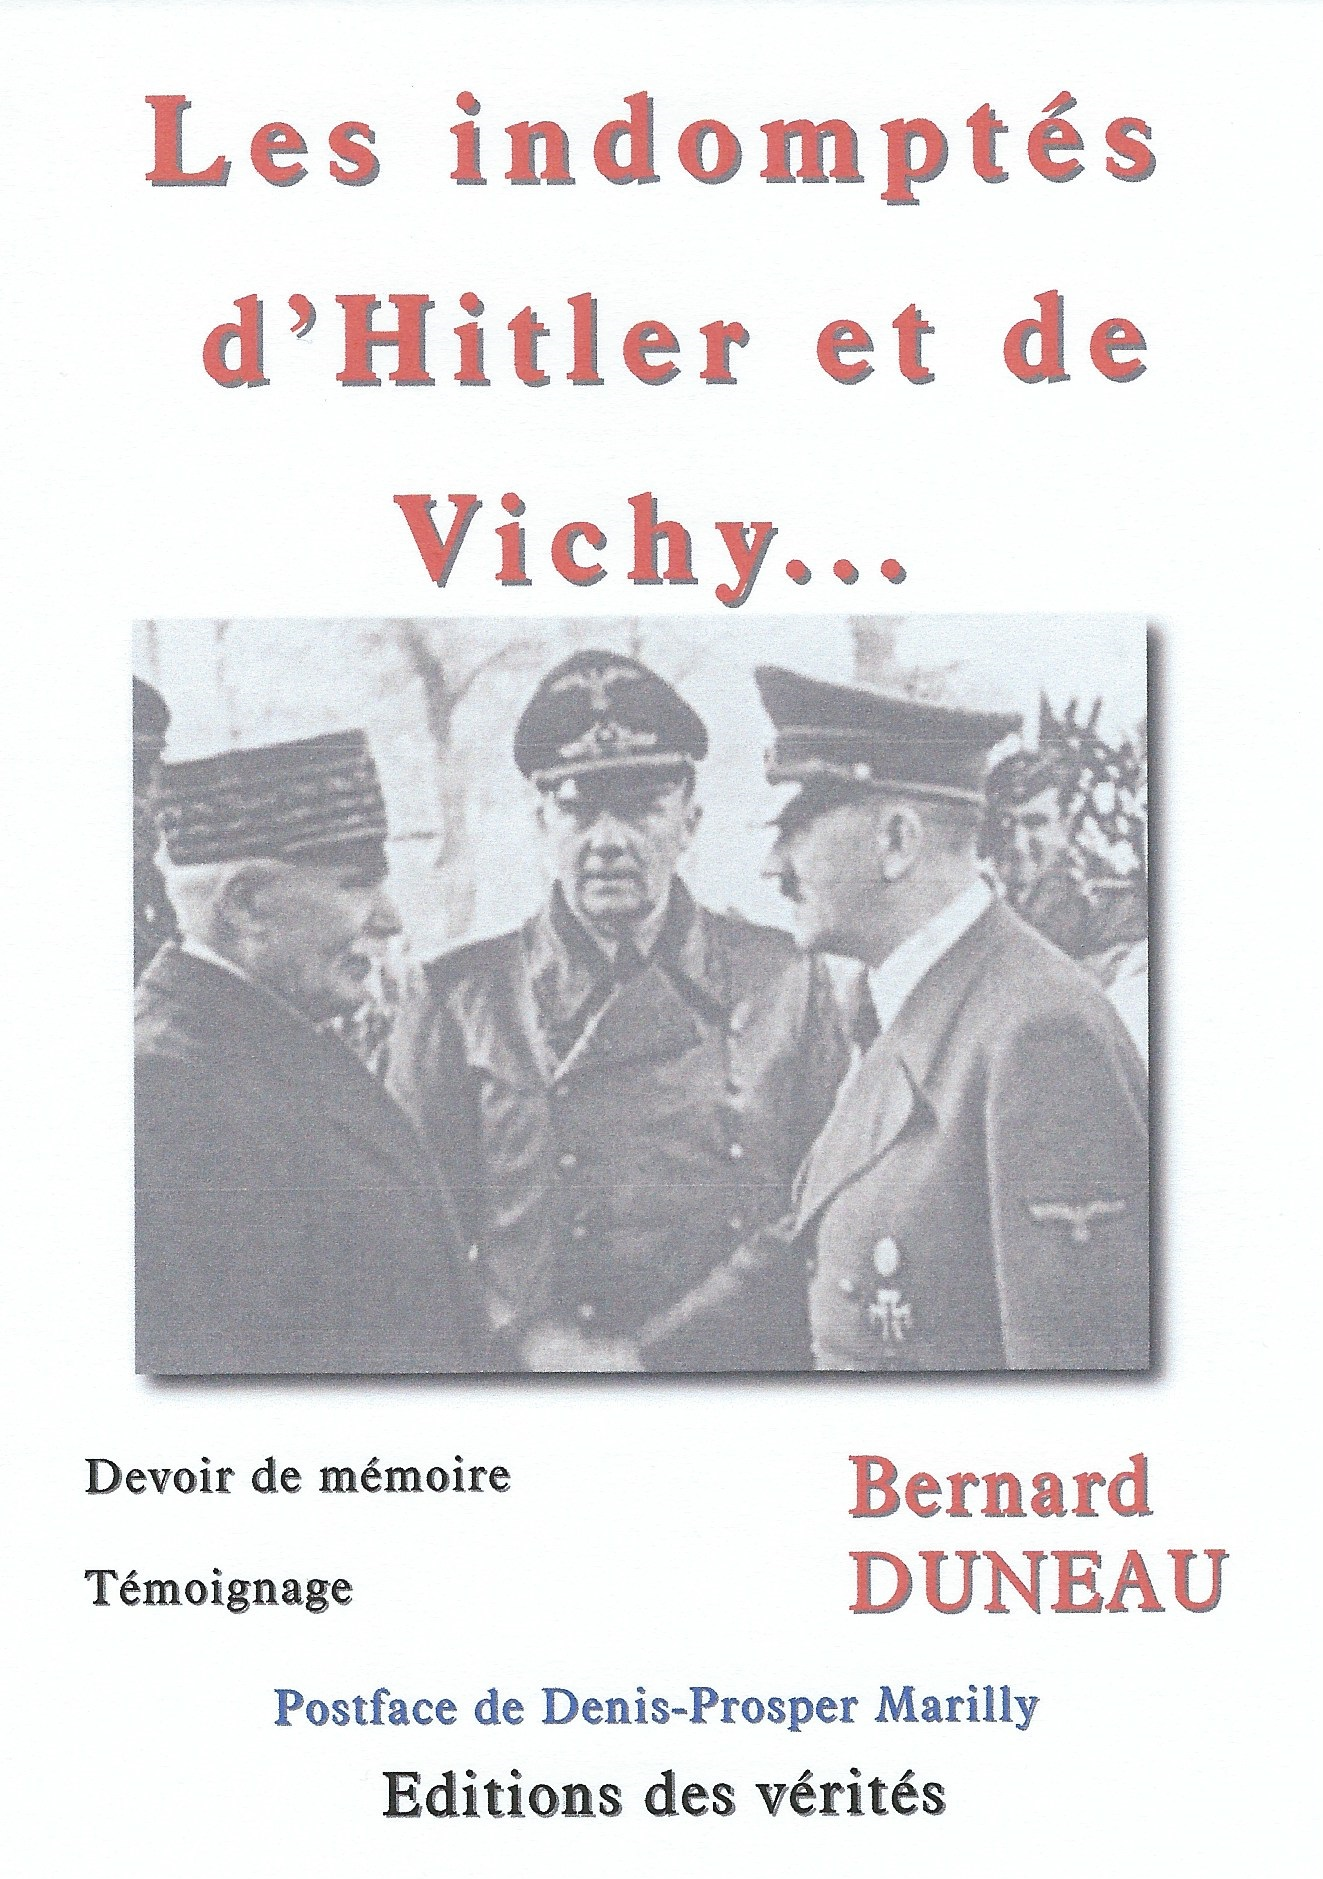 Les indomptés d'Hitler et de Vichy... - Bernard DUNEAU